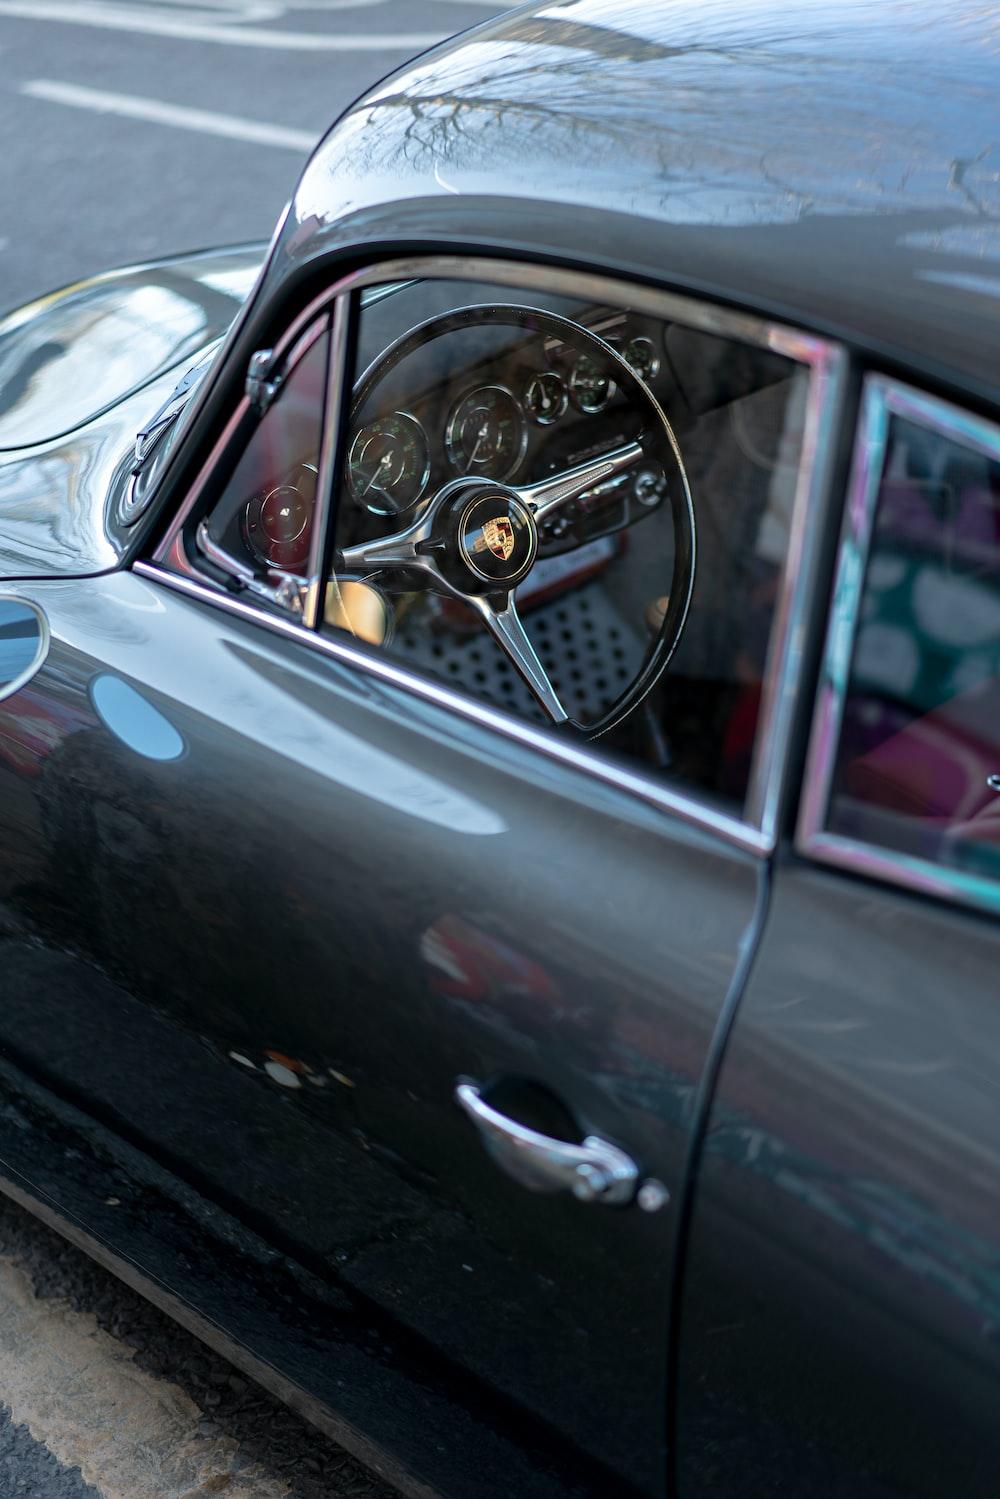 black car with silver steering wheel